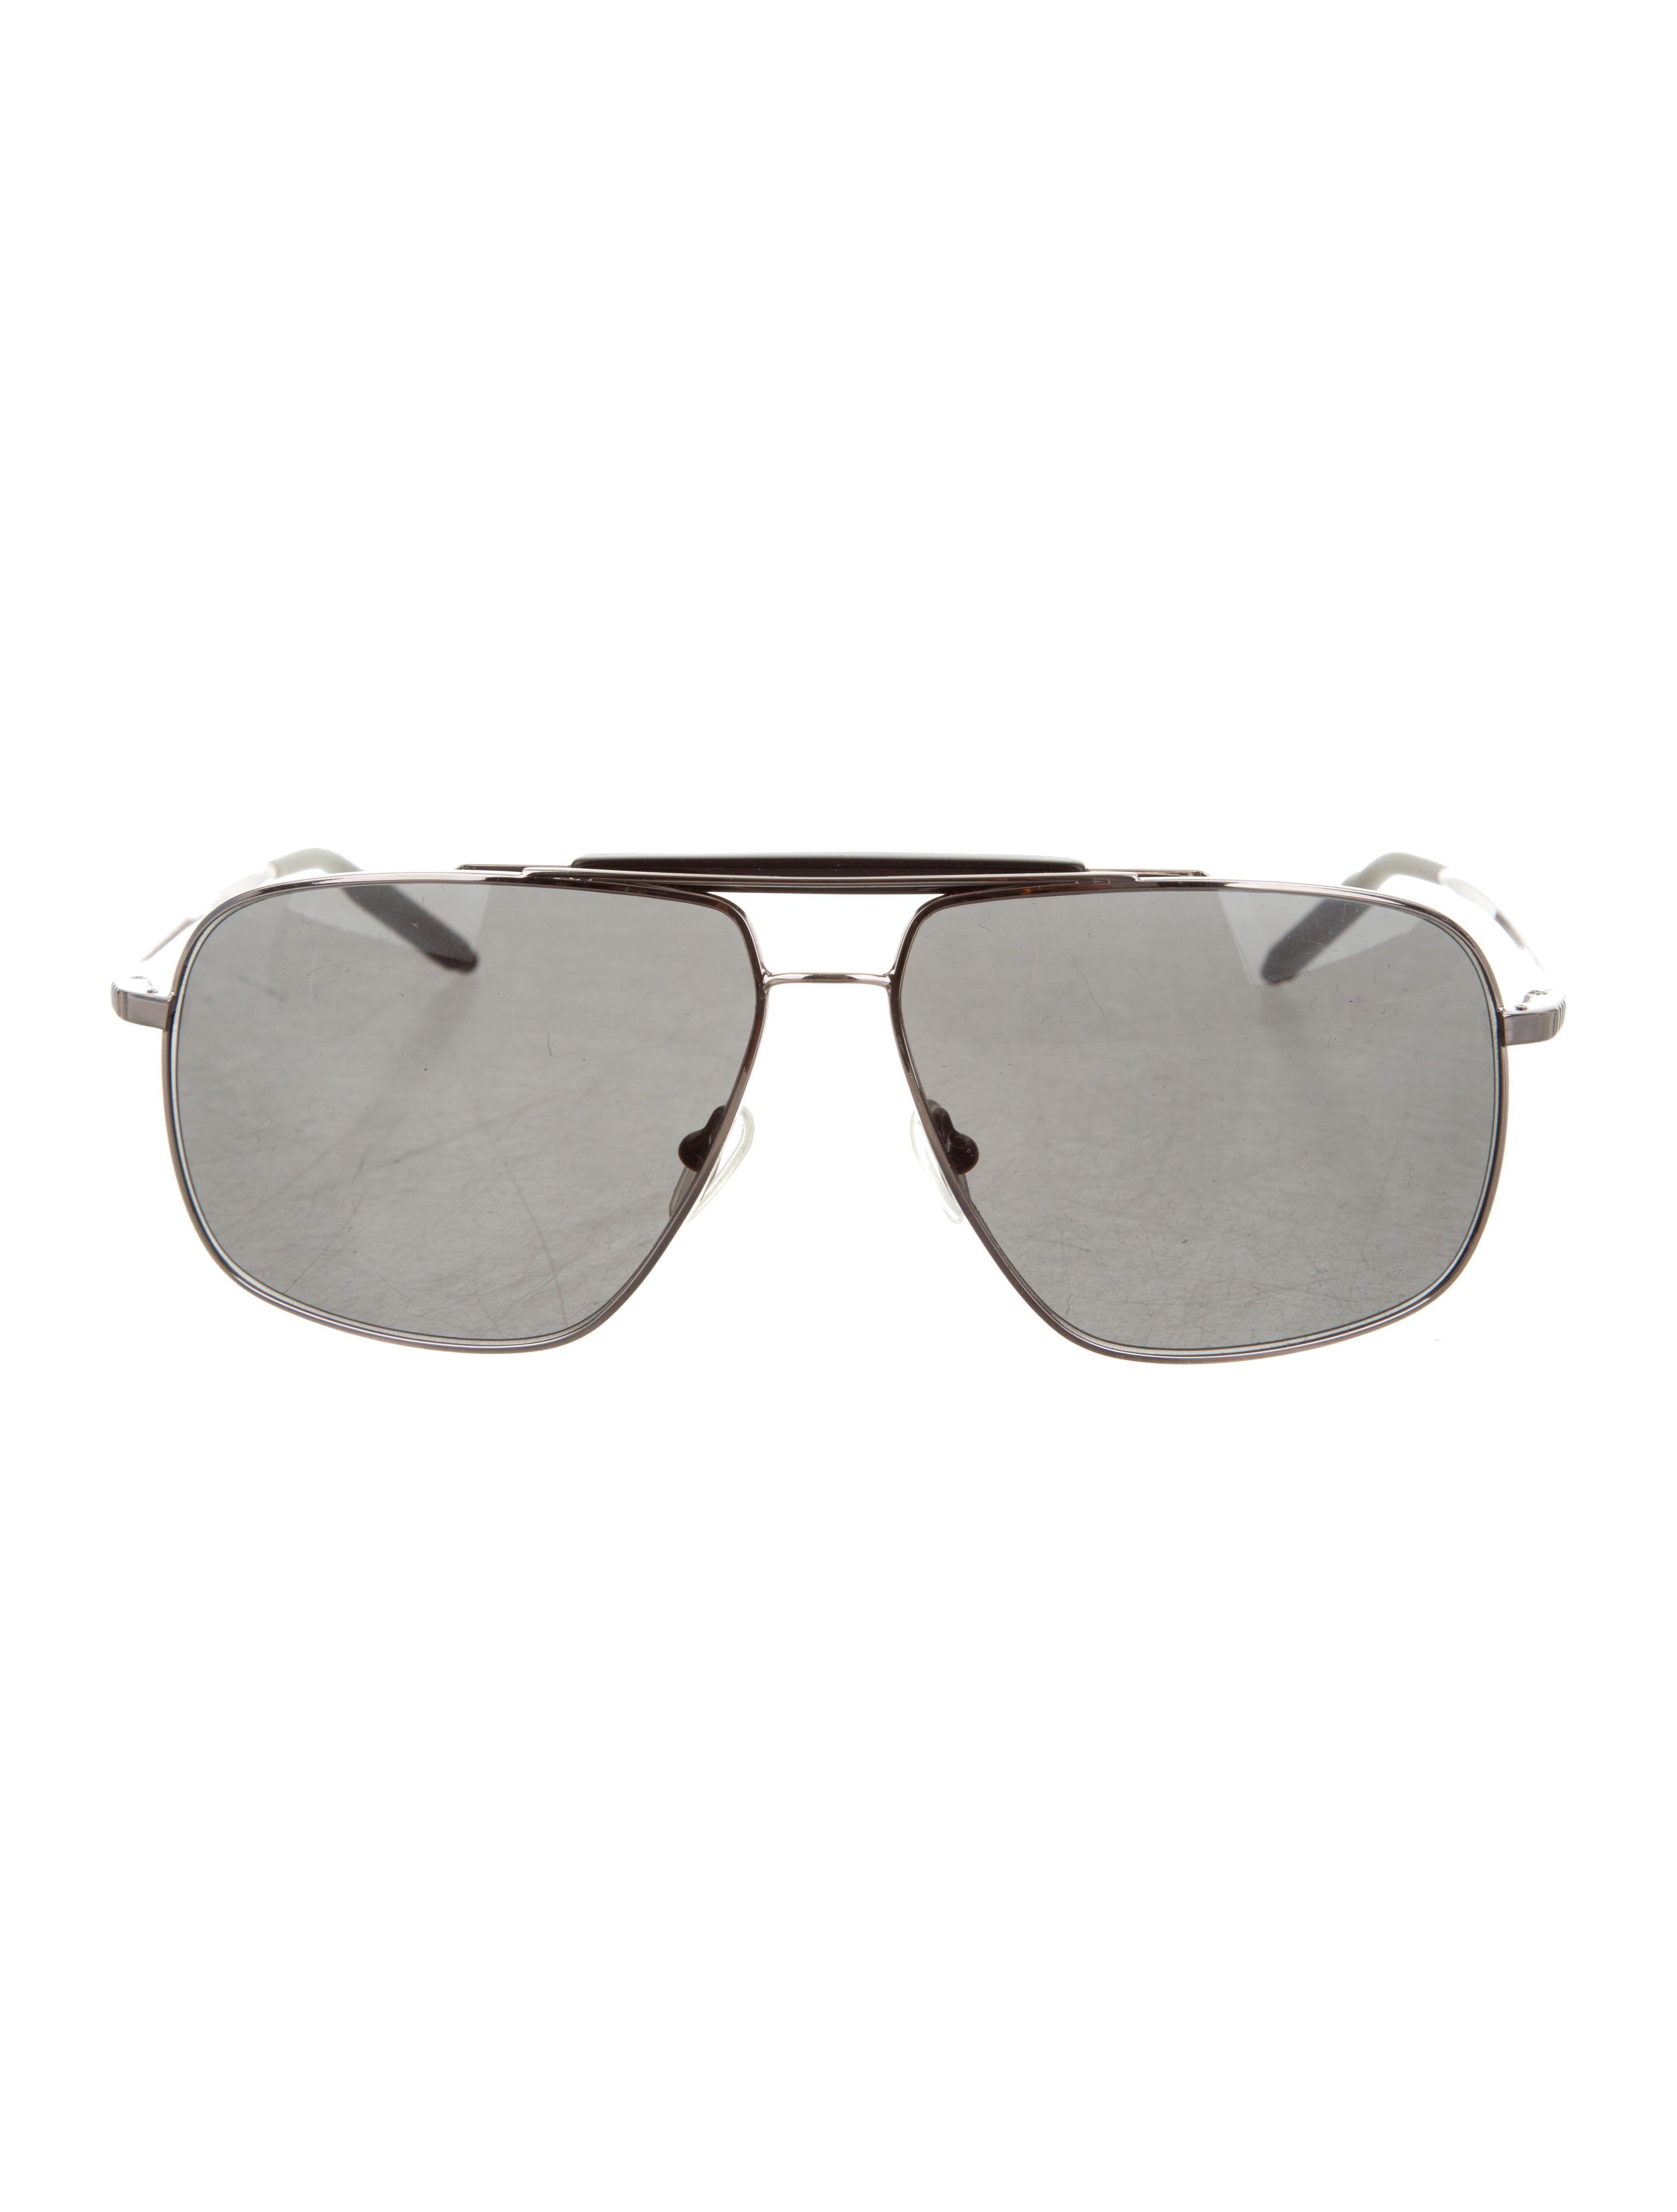 bcb64e30d5f92 Mosley Tribes Dunn Aviator Sunglasses - Accessories - W8Y20065